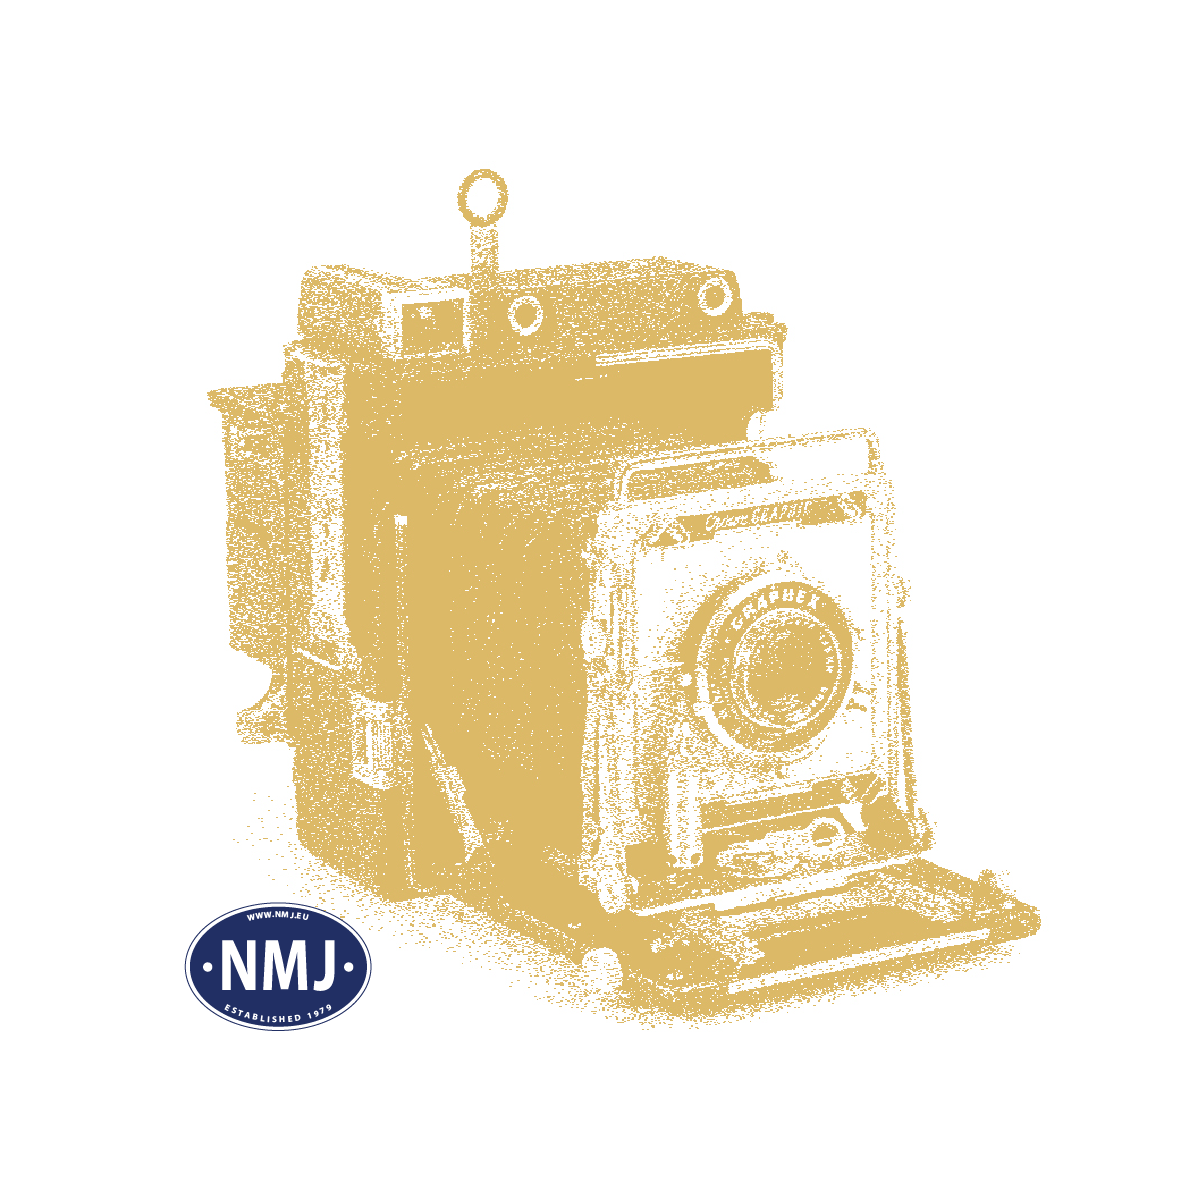 NMJT84.102 - NMJ Topline NSB BM69A.07, DCC m/ Lyd